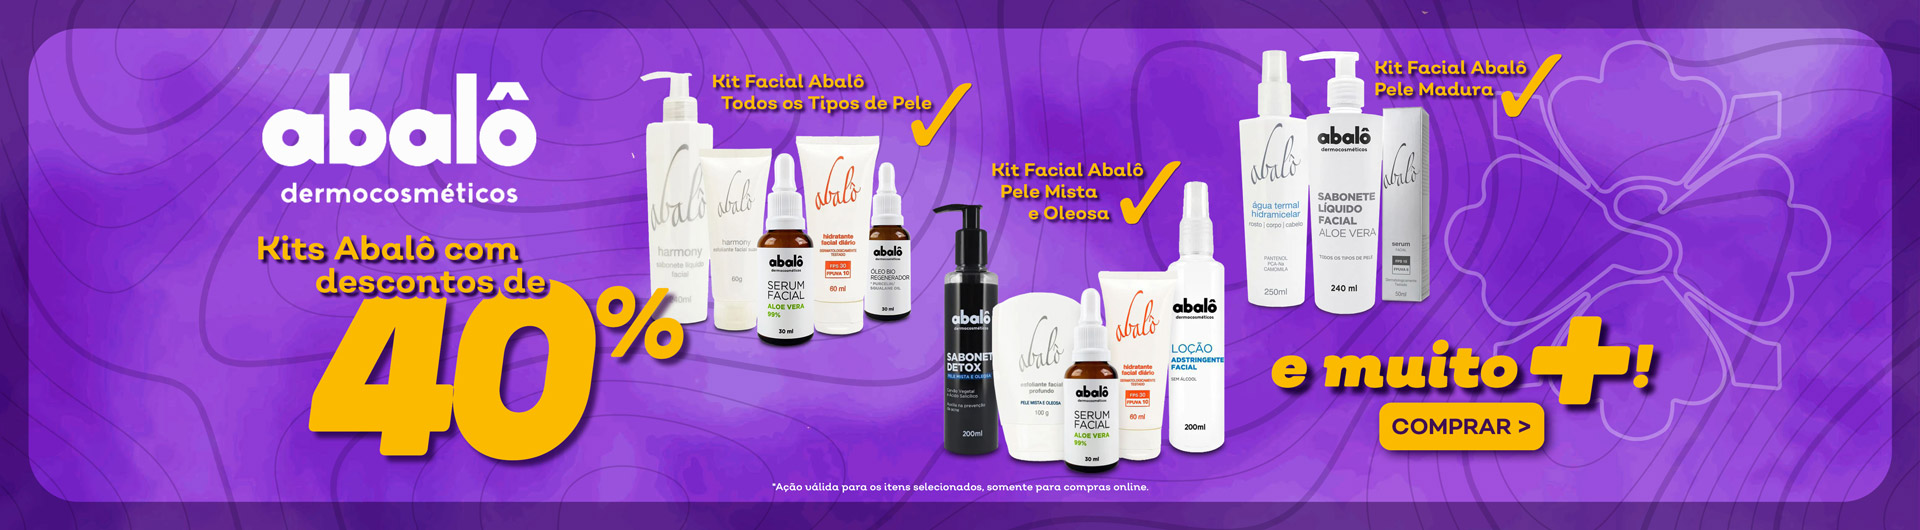 Abalo 40% Off Kit Facial